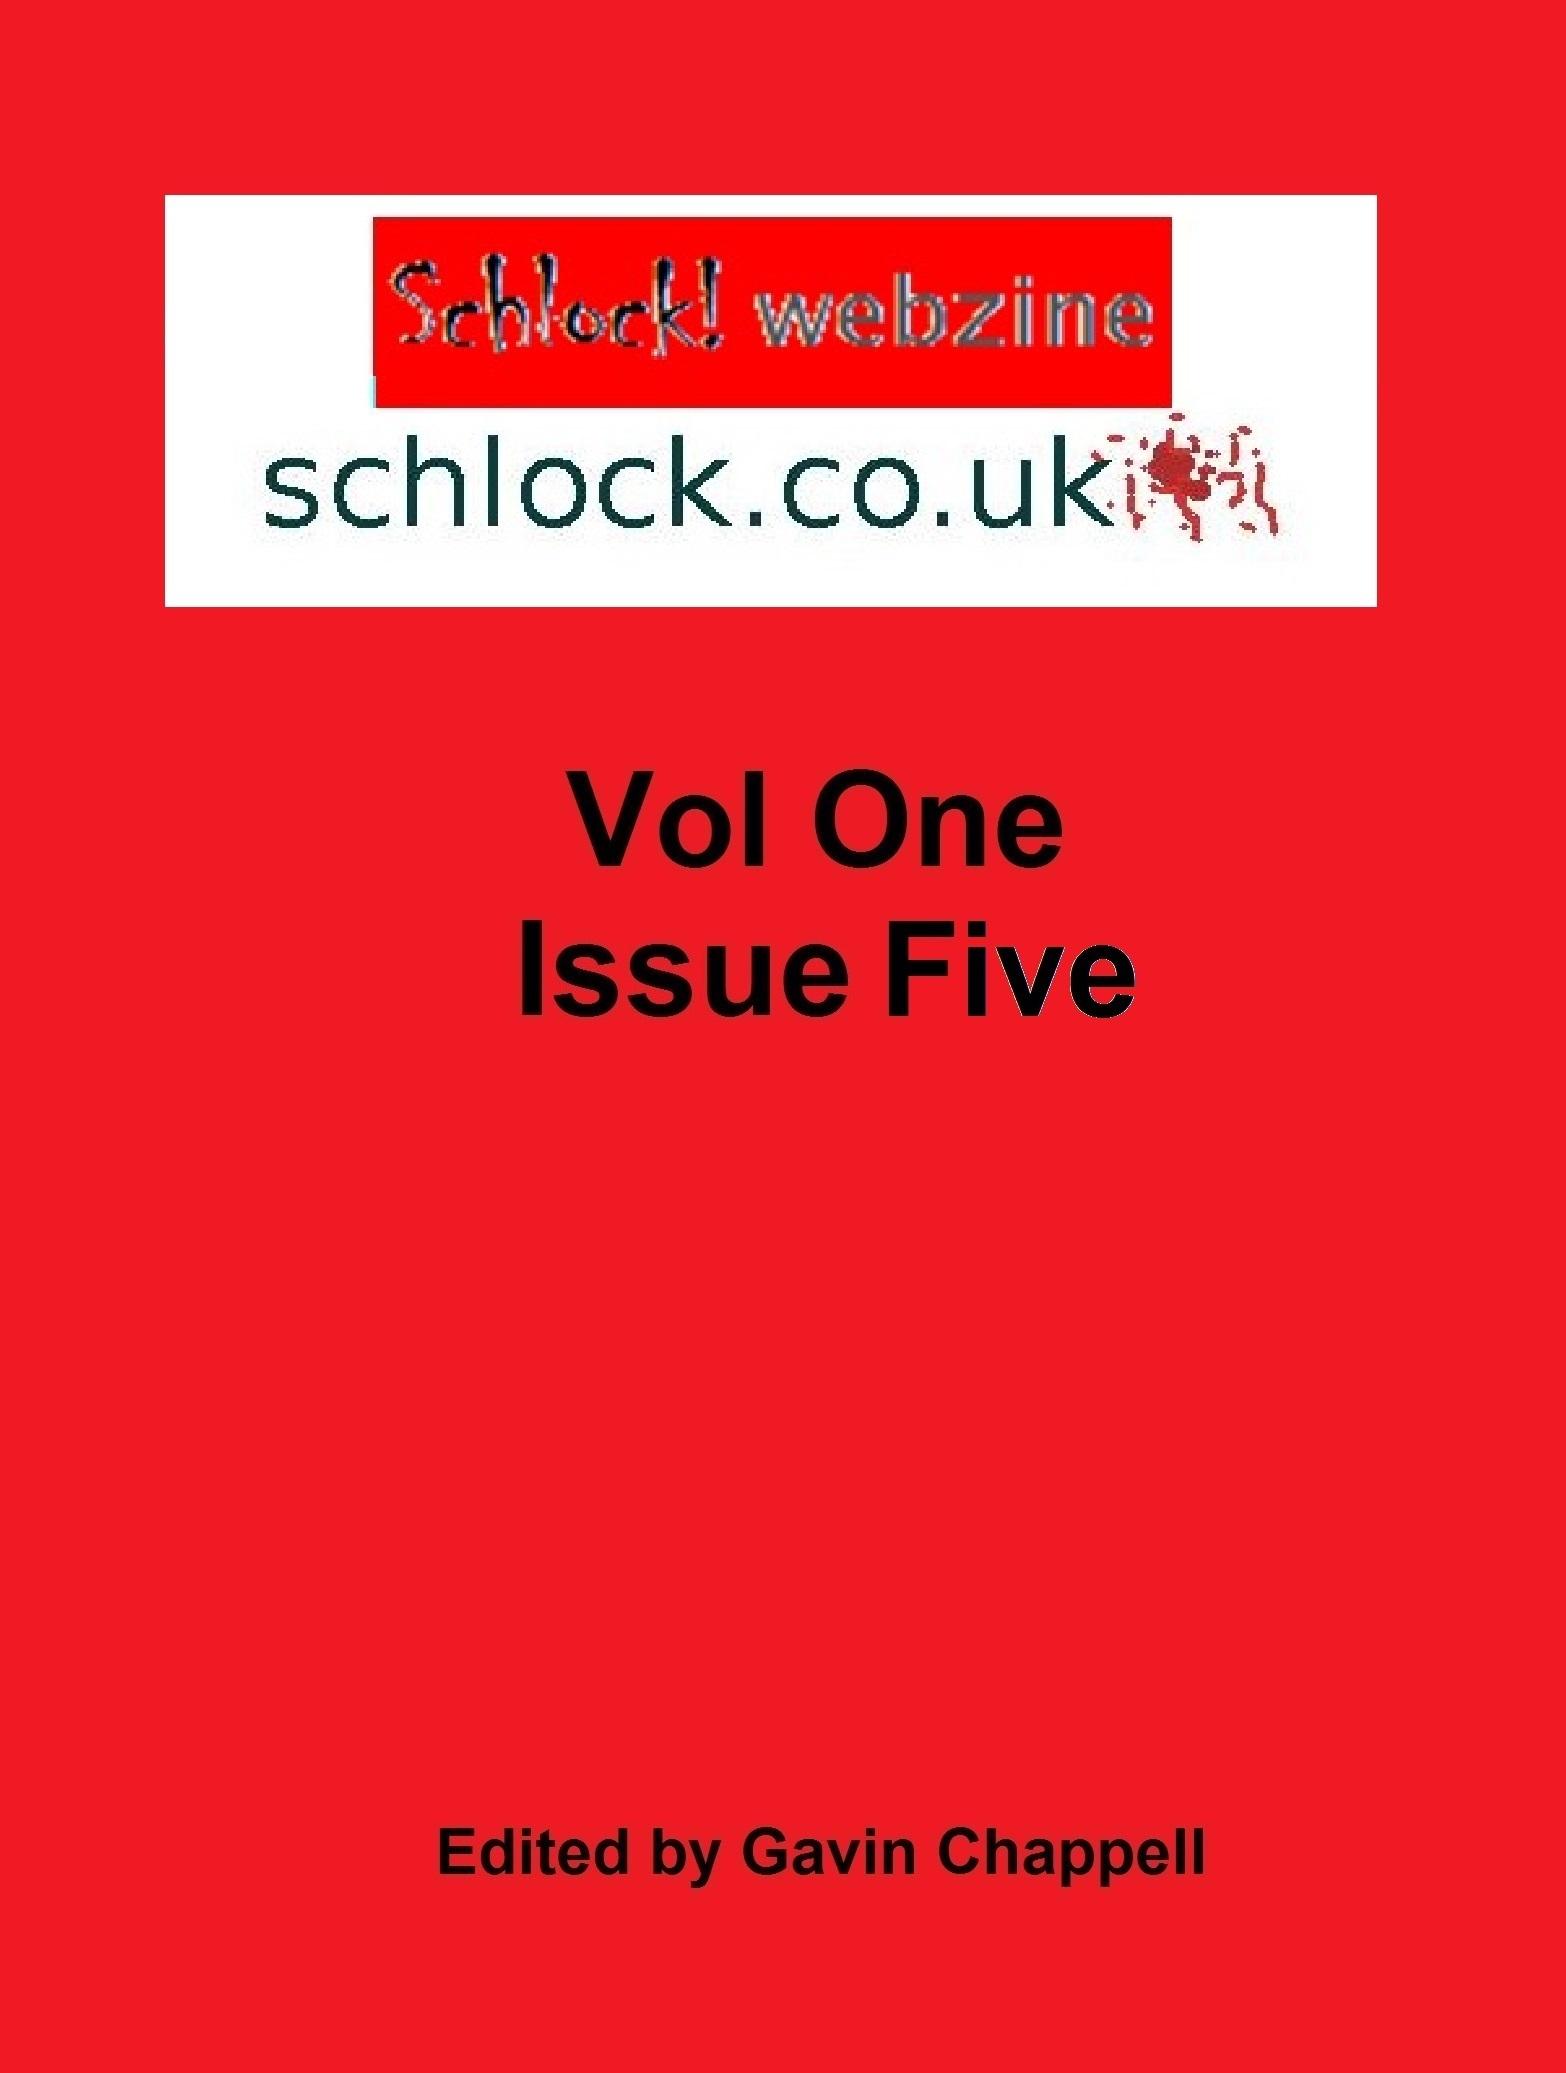 Schlock! Webzine Vol 1 Iss 5  by  Gavin Chappell